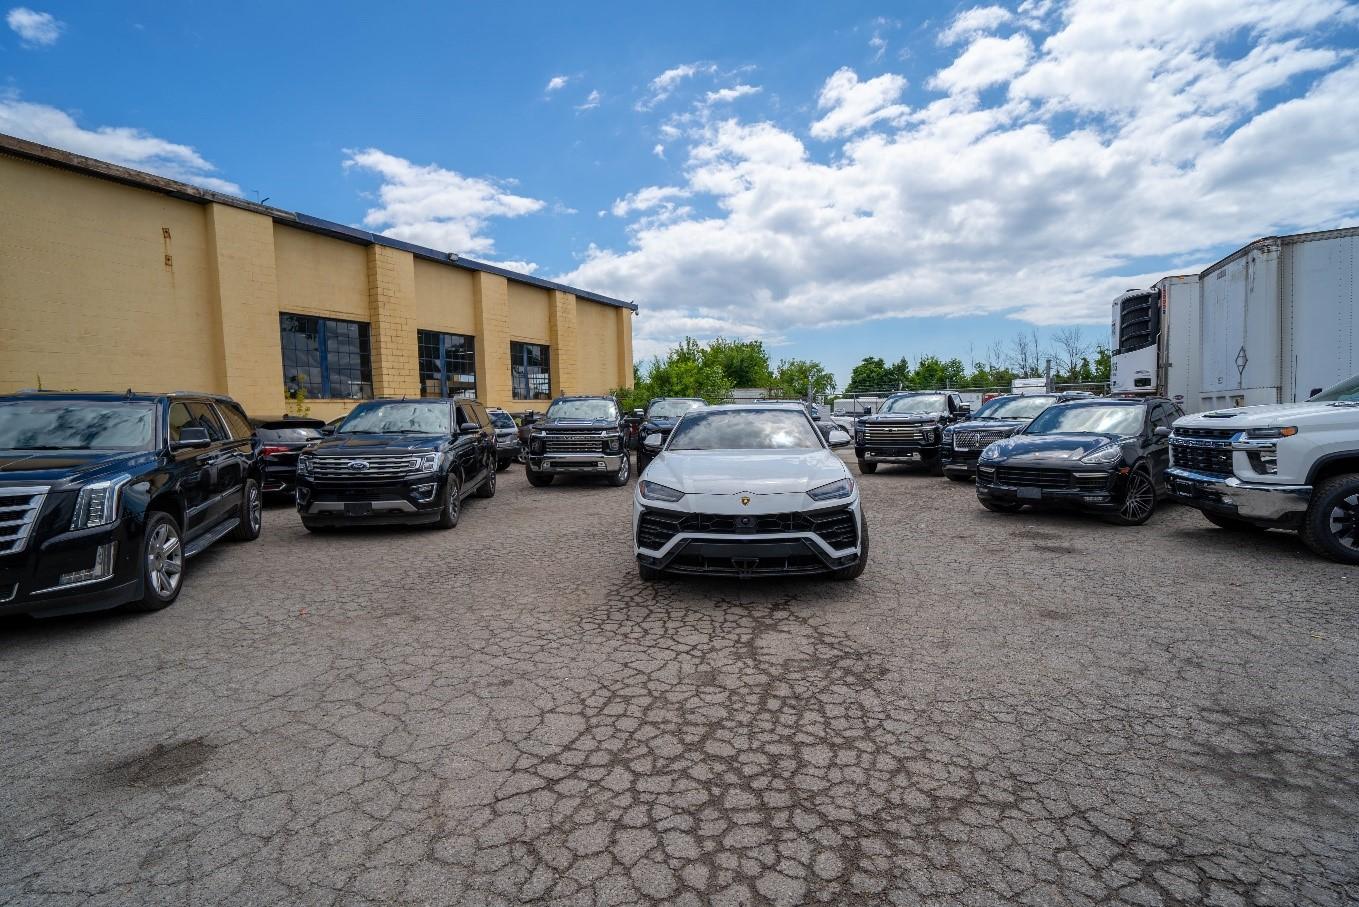 Vehicle lifters in Peel Regional Police Auto Crime Bureau net theft worth Million Dollars